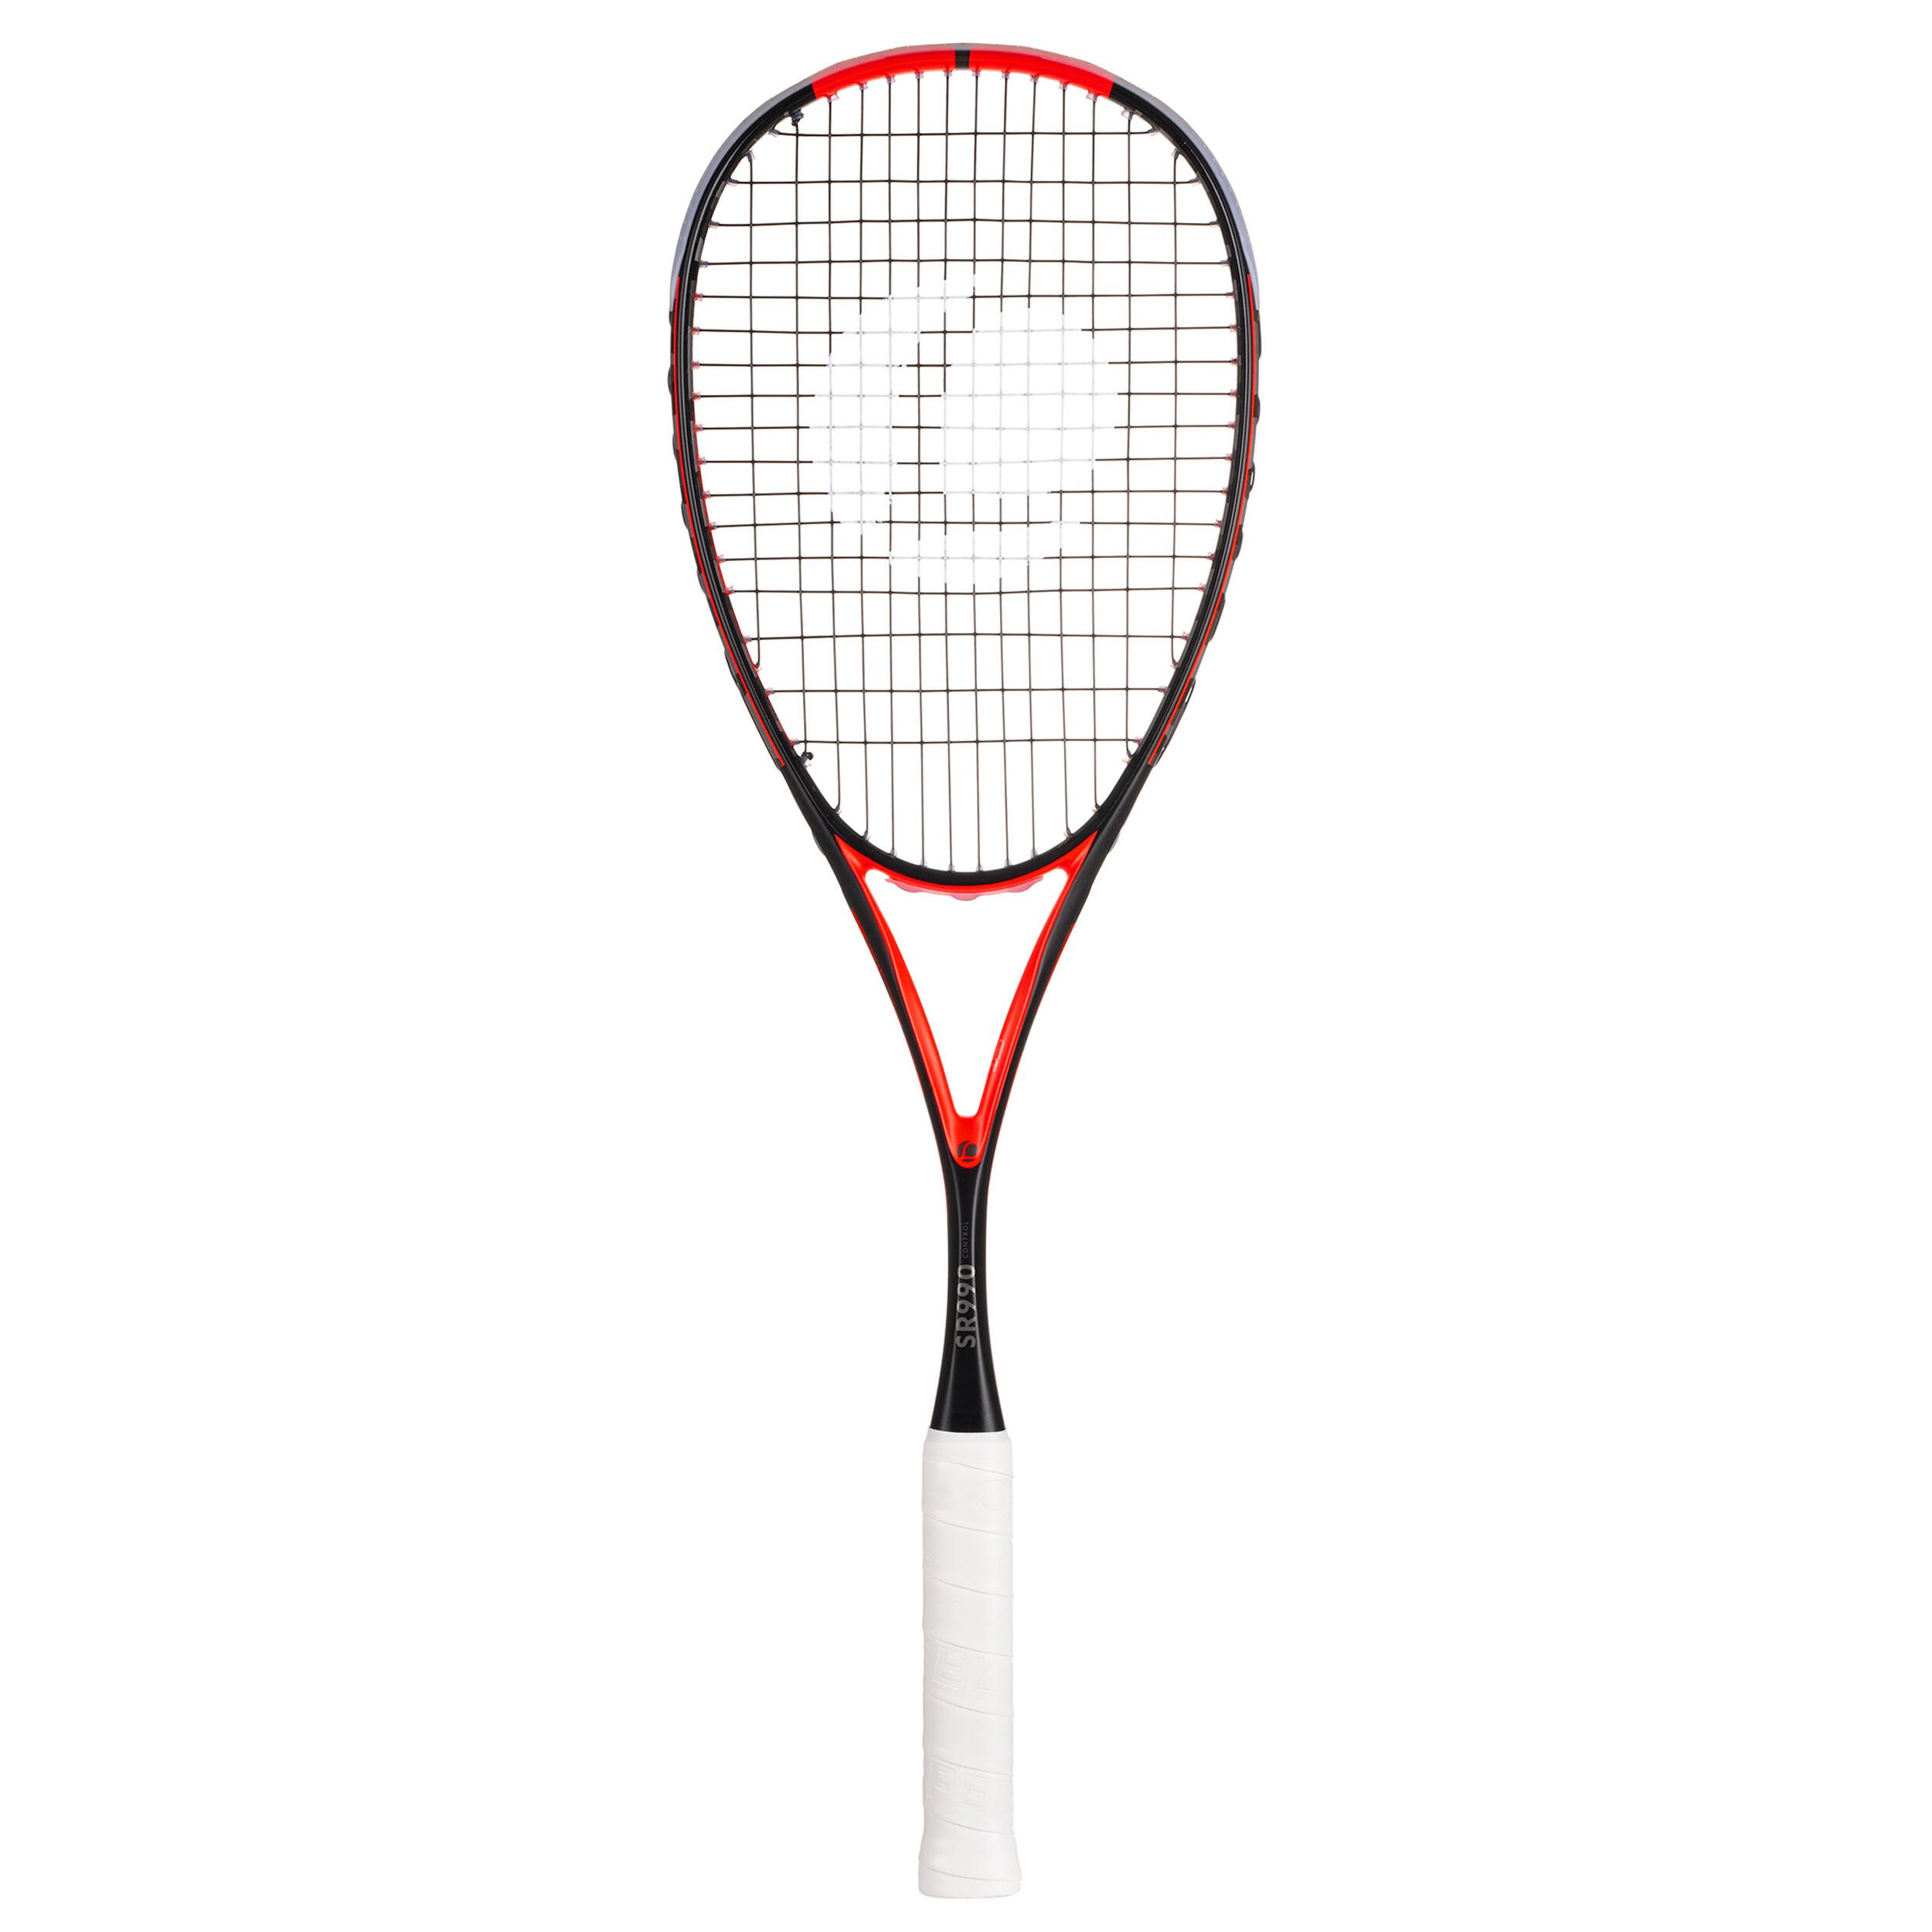 Rachetă Squash SR990 CONTROL